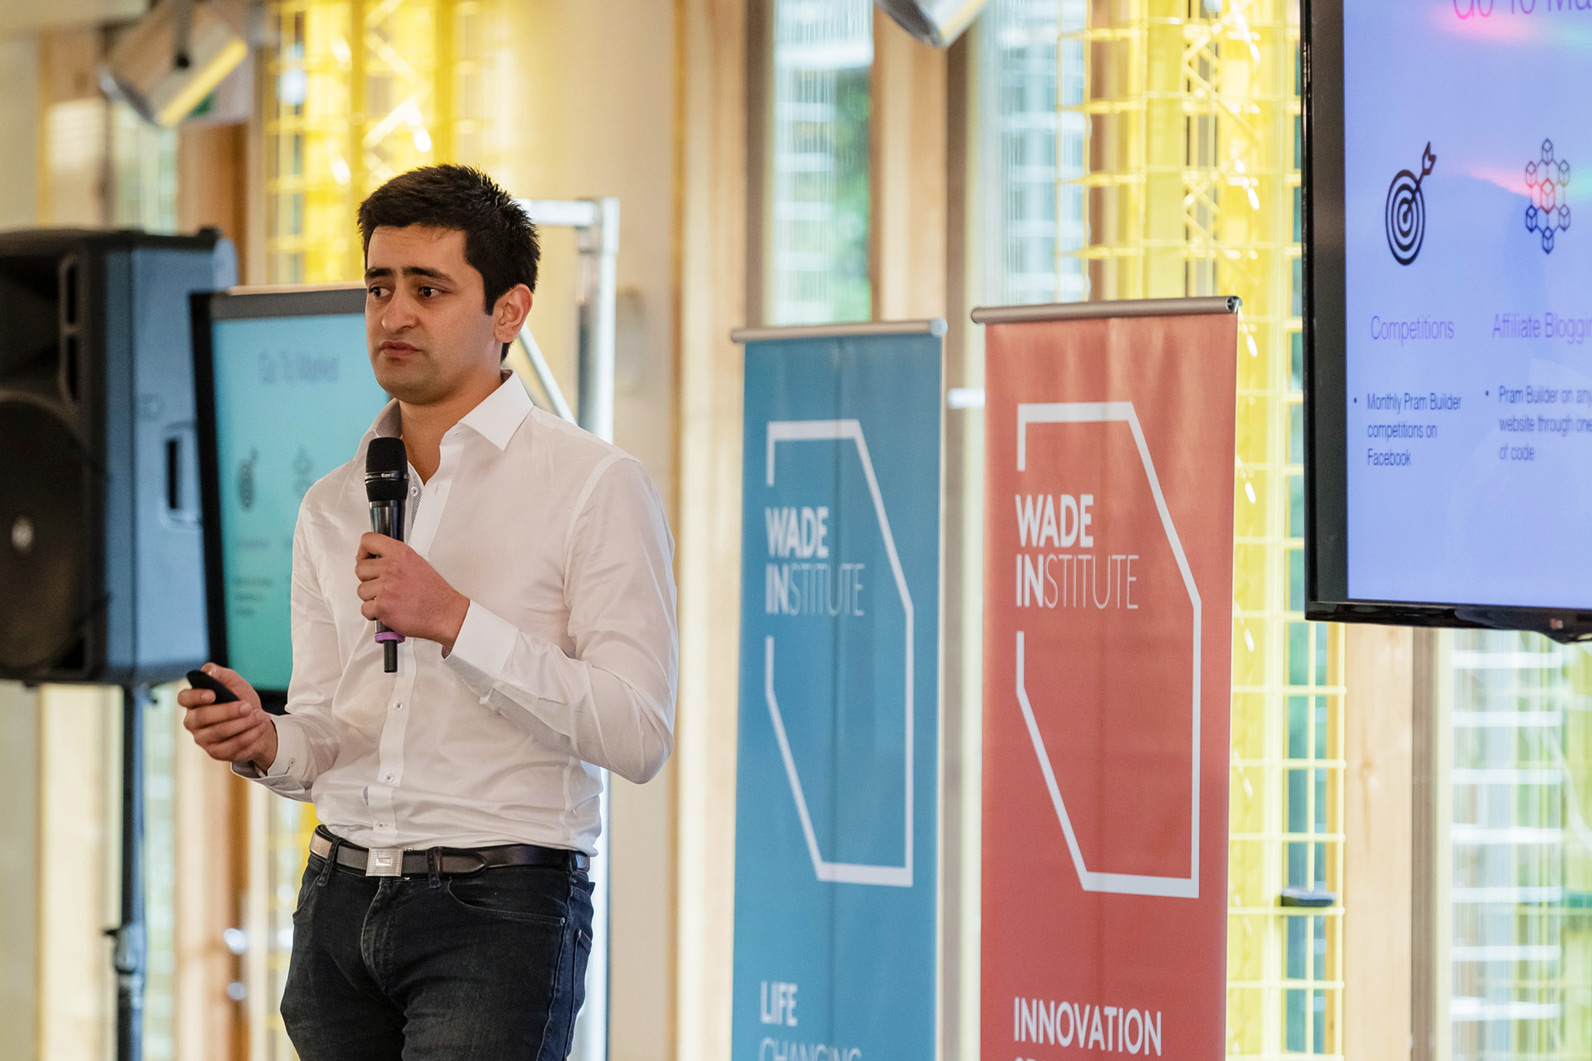 study master of entrepreneurship australia startup vicstudy master of entrepreneurship australia startup vic